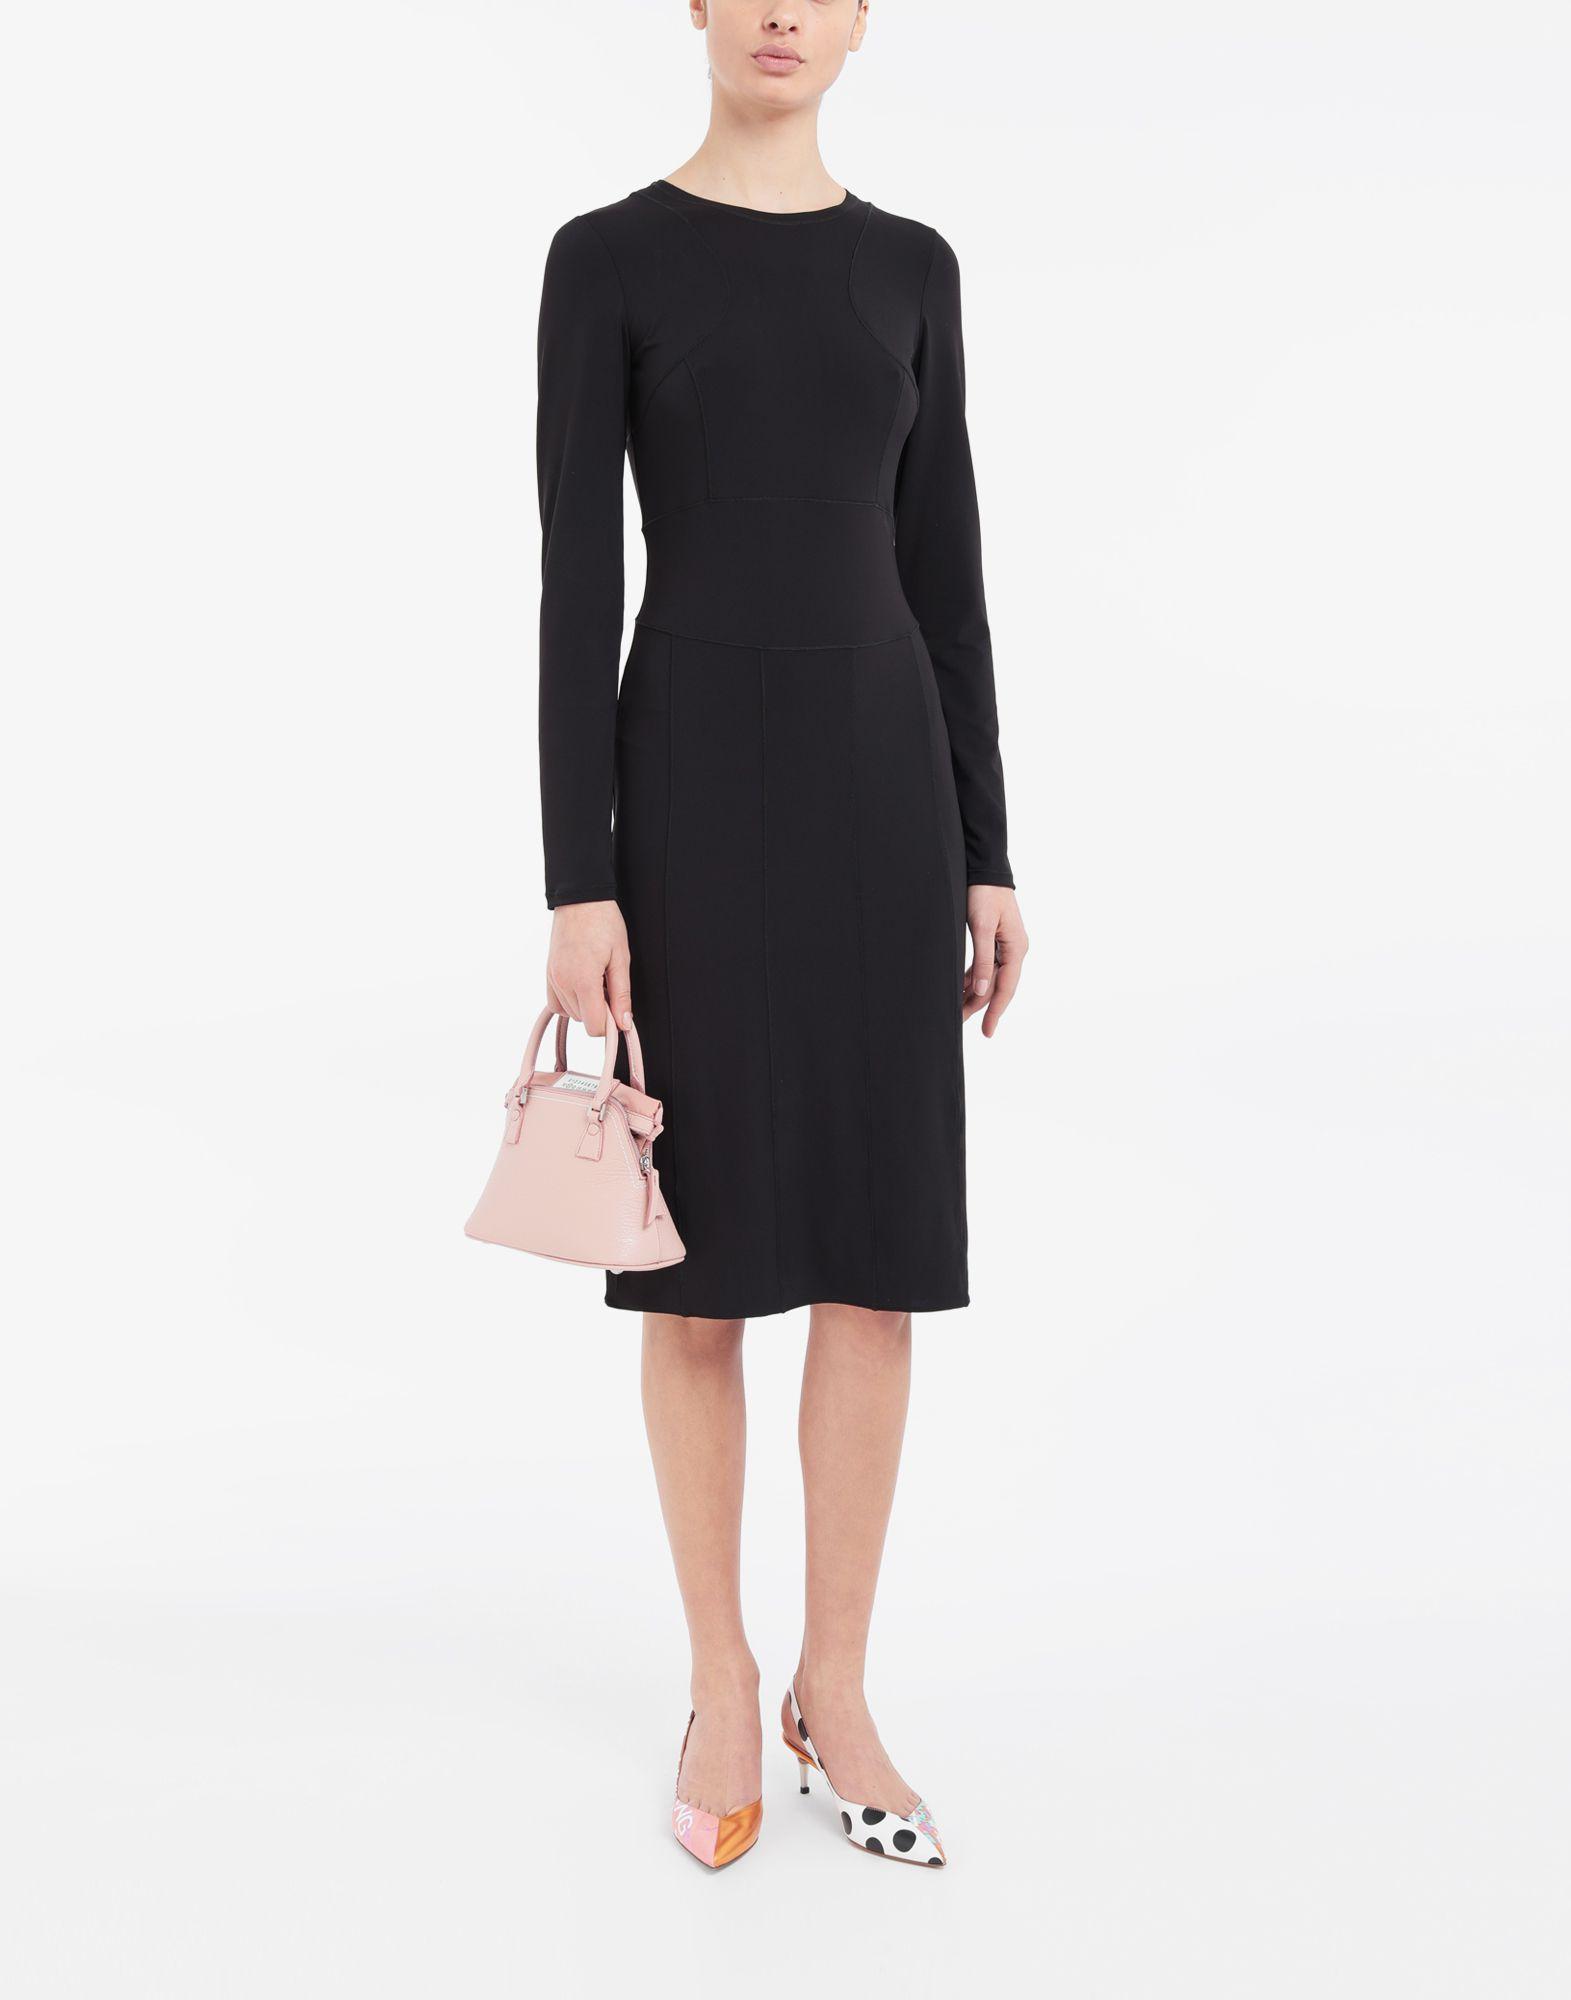 MAISON MARGIELA Stitch-jacquard jersey knit dress 3/4 length dress Woman d